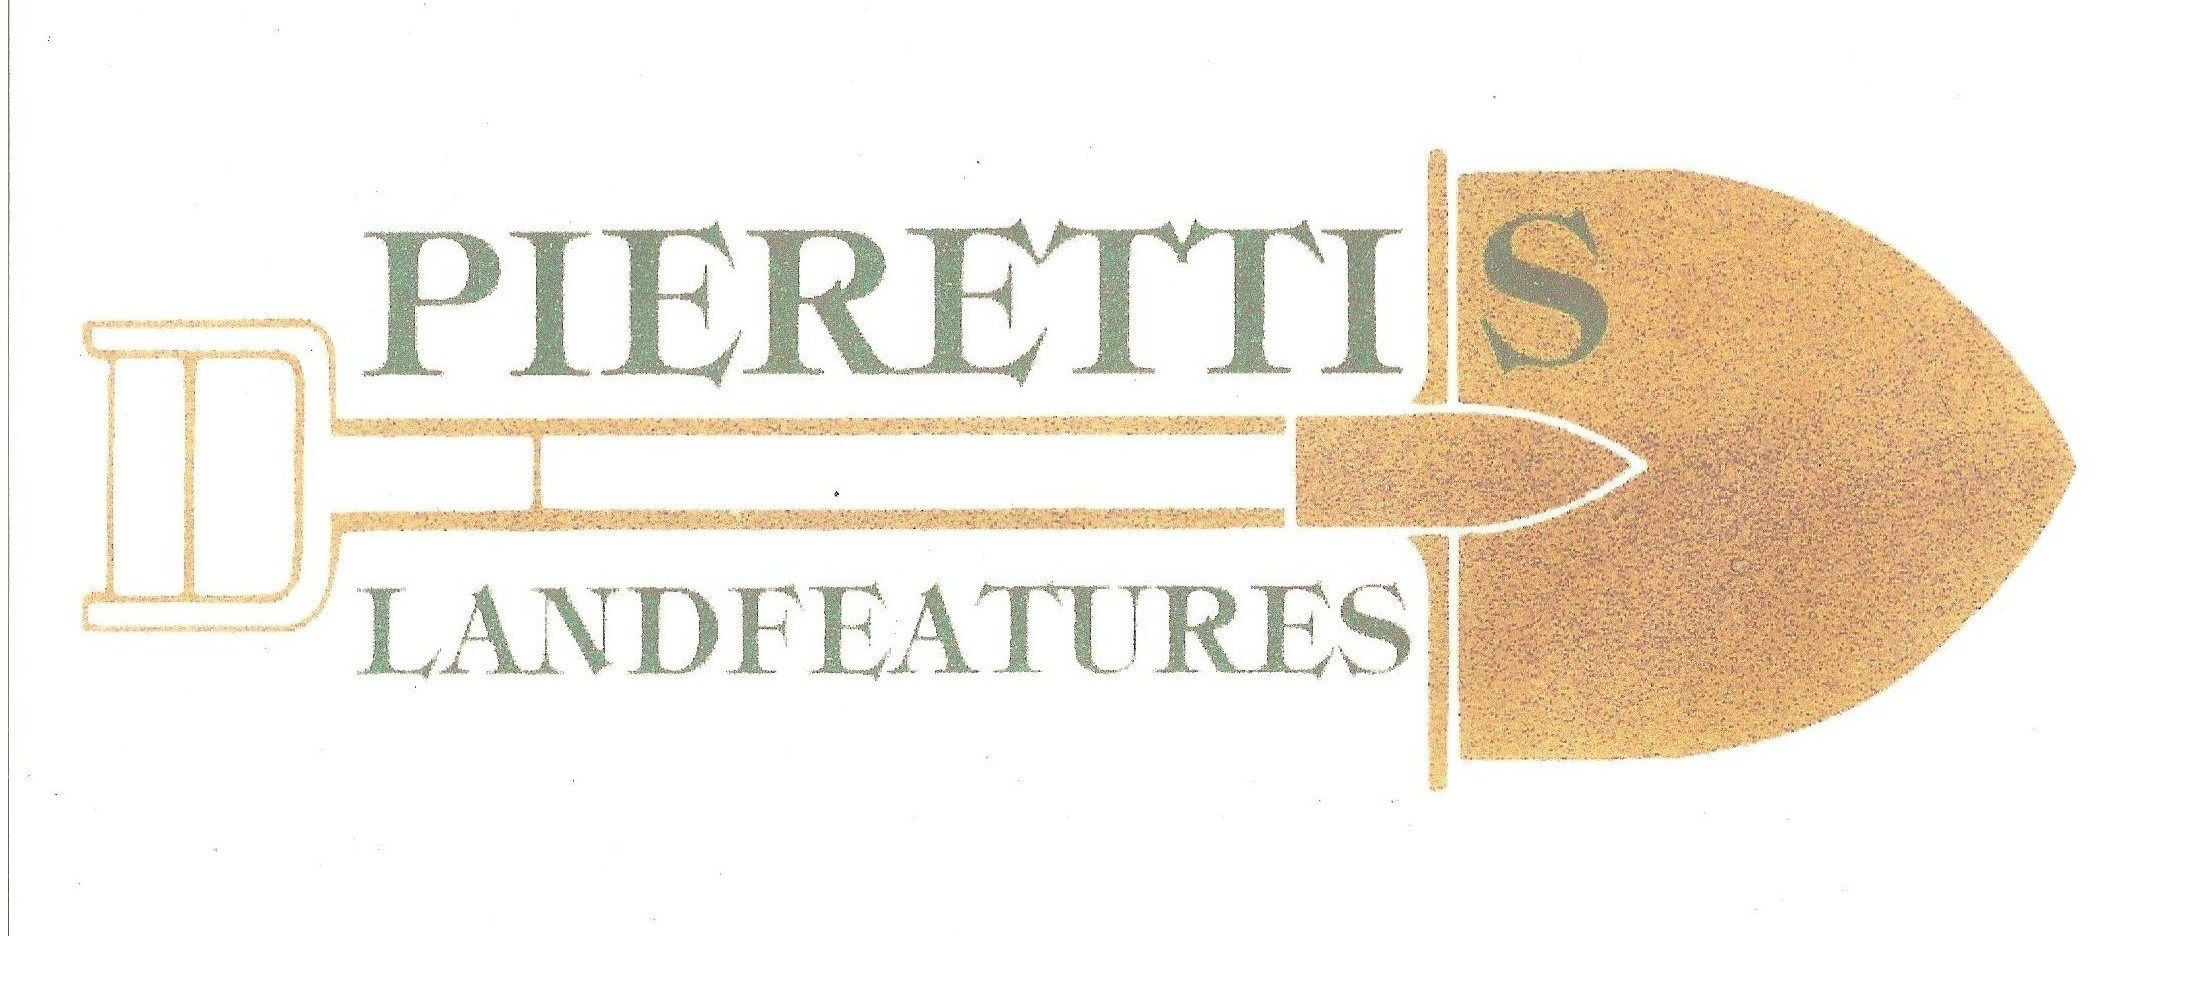 Pieretti S Landfeatures Reviews Avondale Pa Angie S List